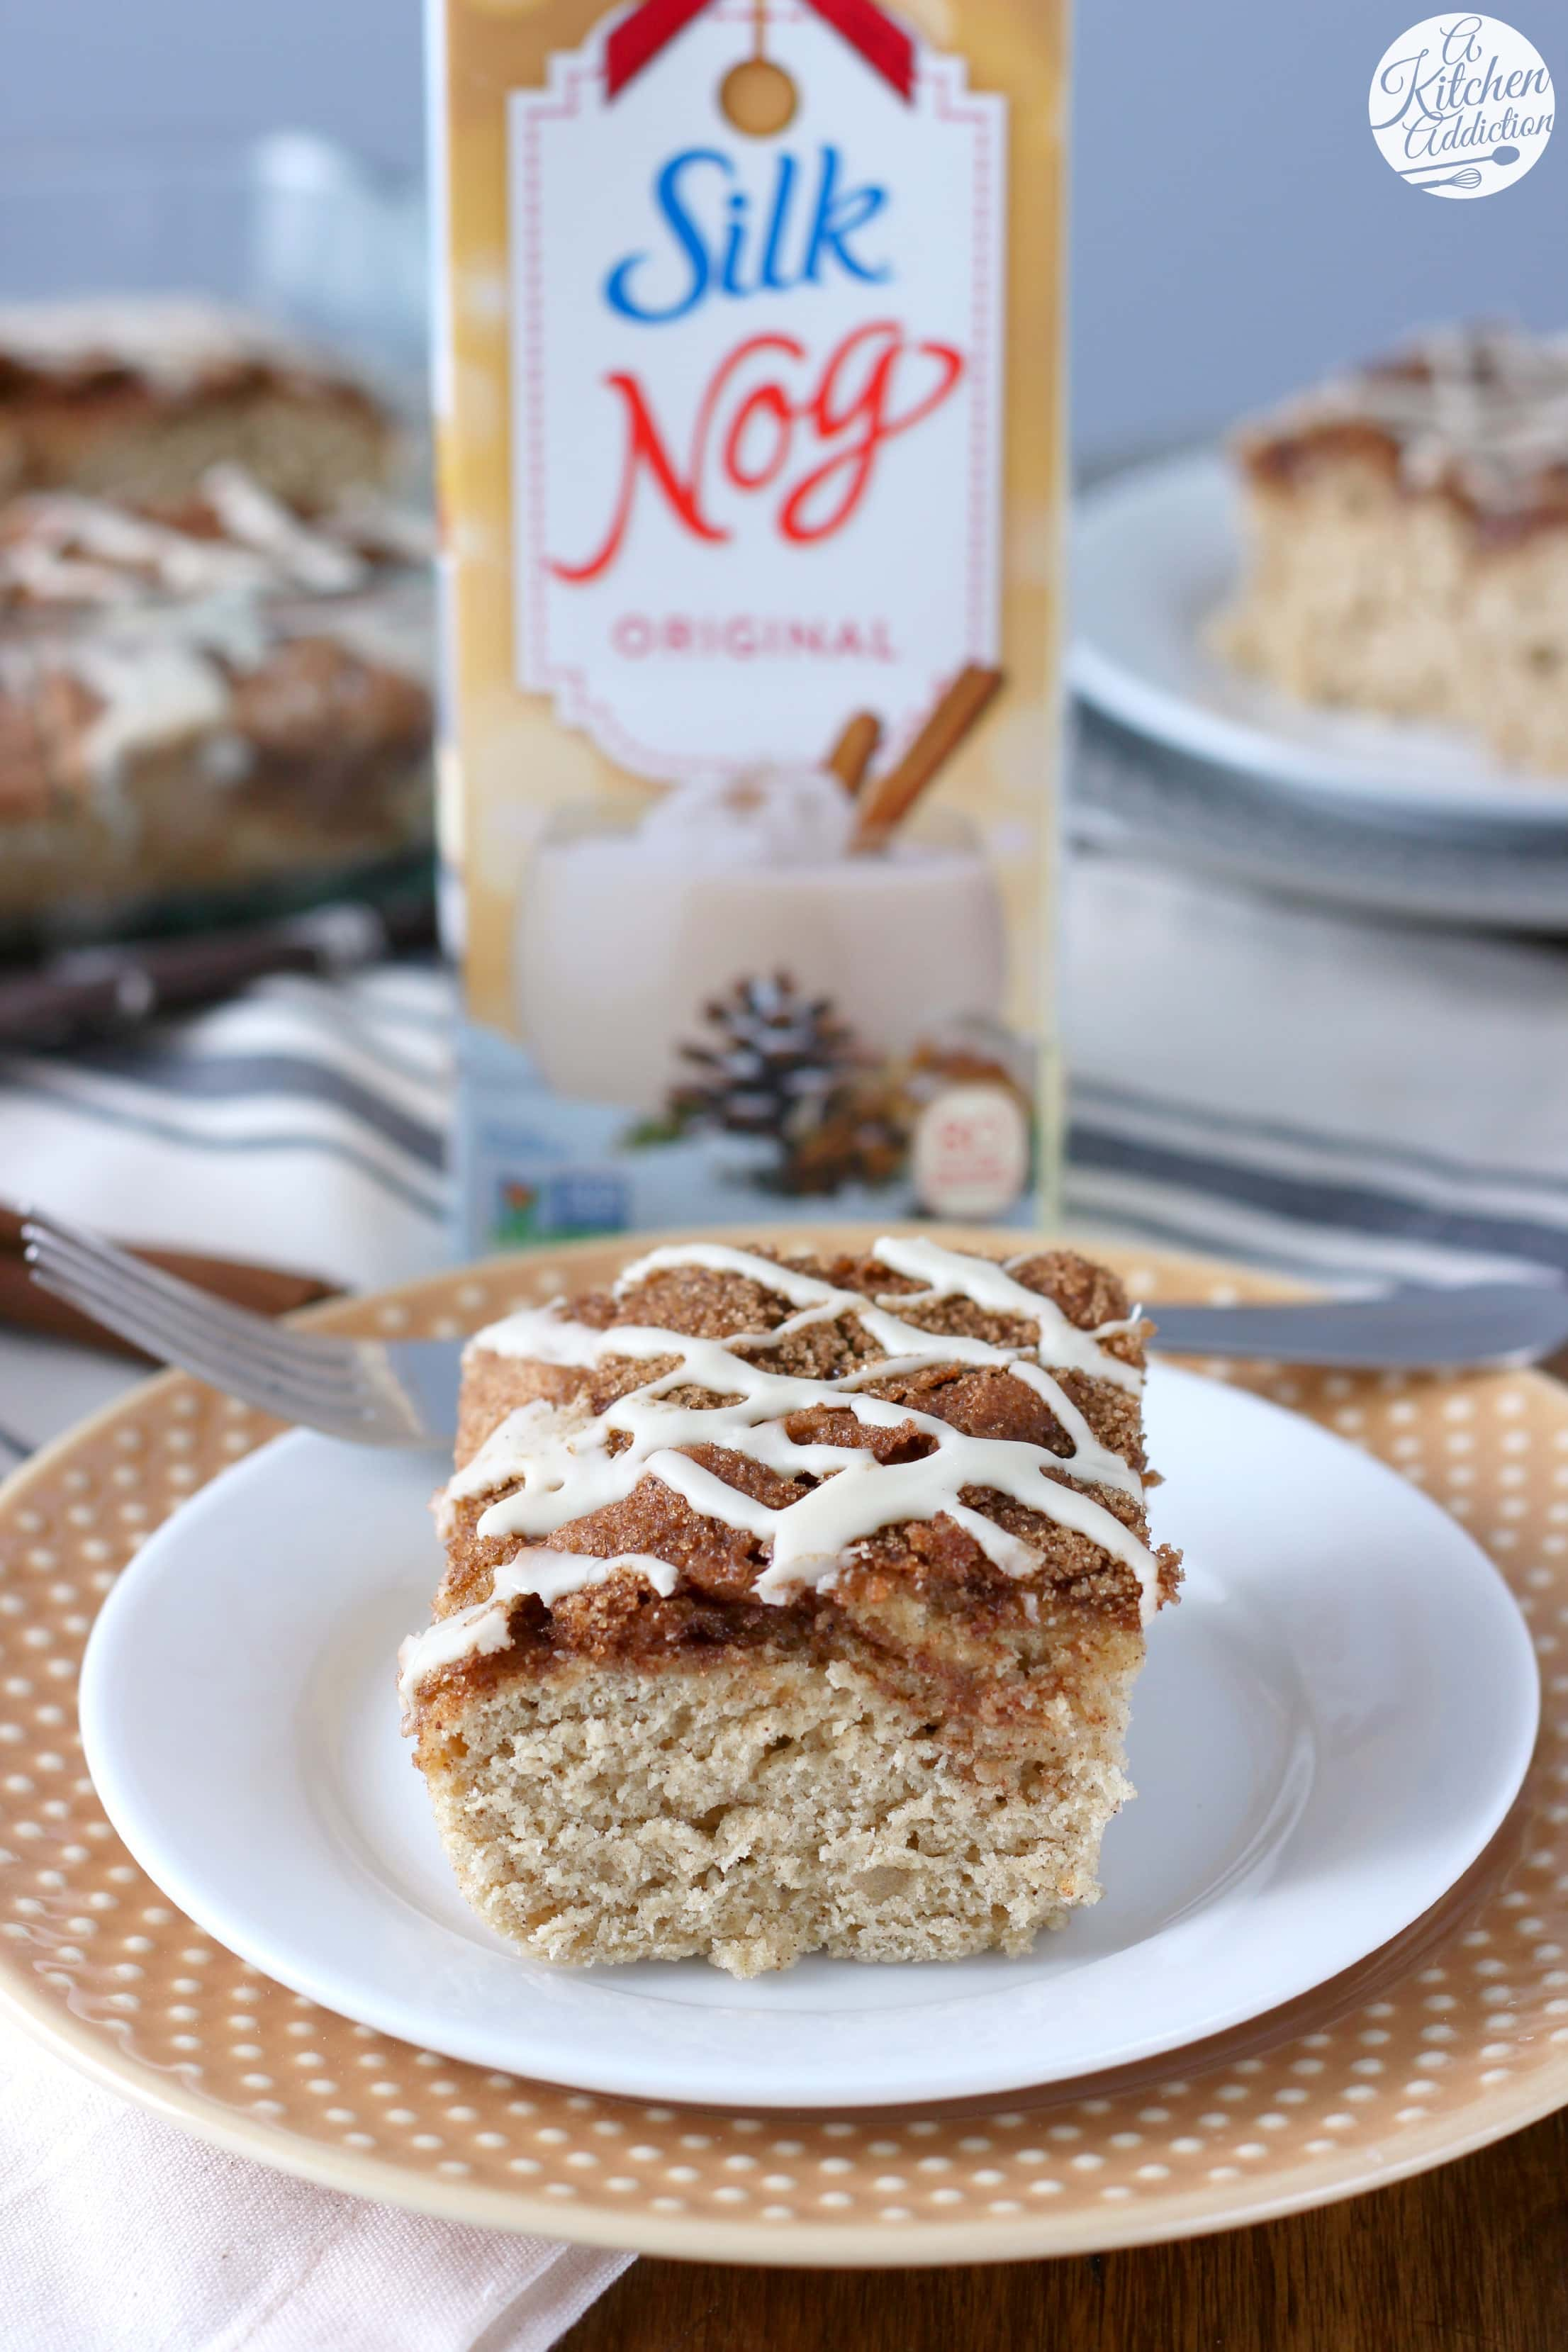 Dairy Free Glazed Eggnog Cinnamon Swirl Cake from A Kitchen Addiction